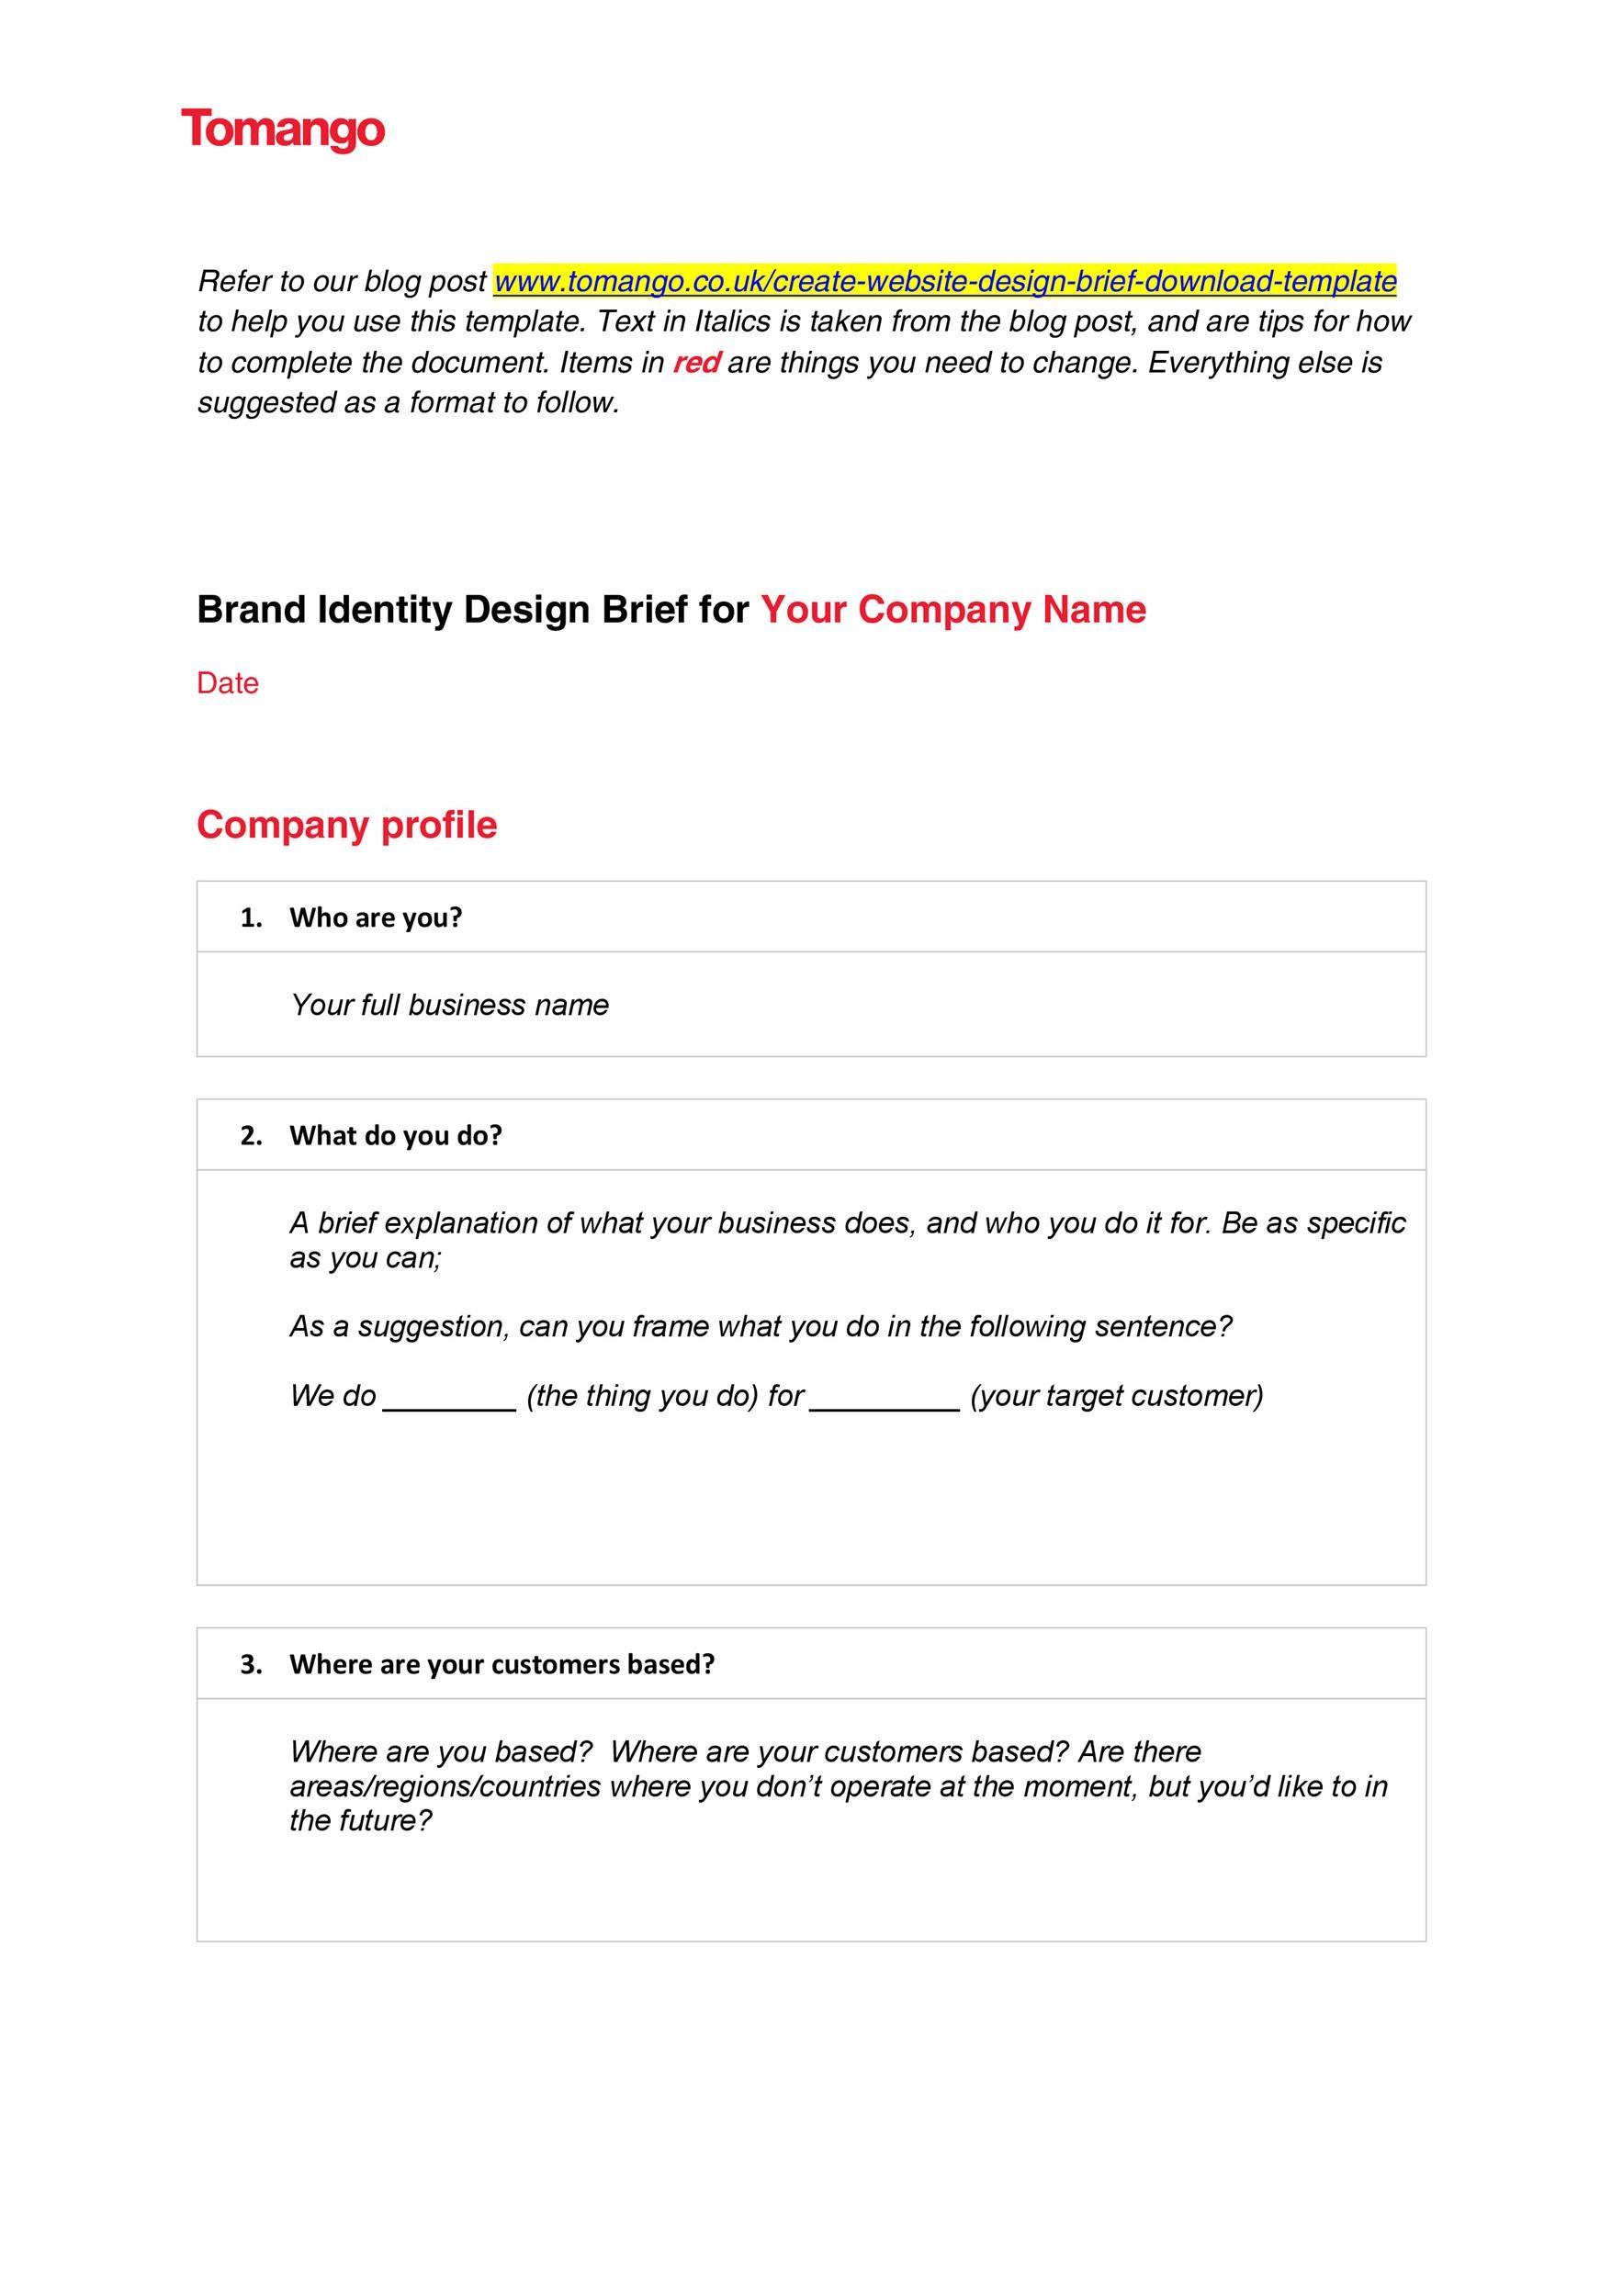 Free design brief template 25